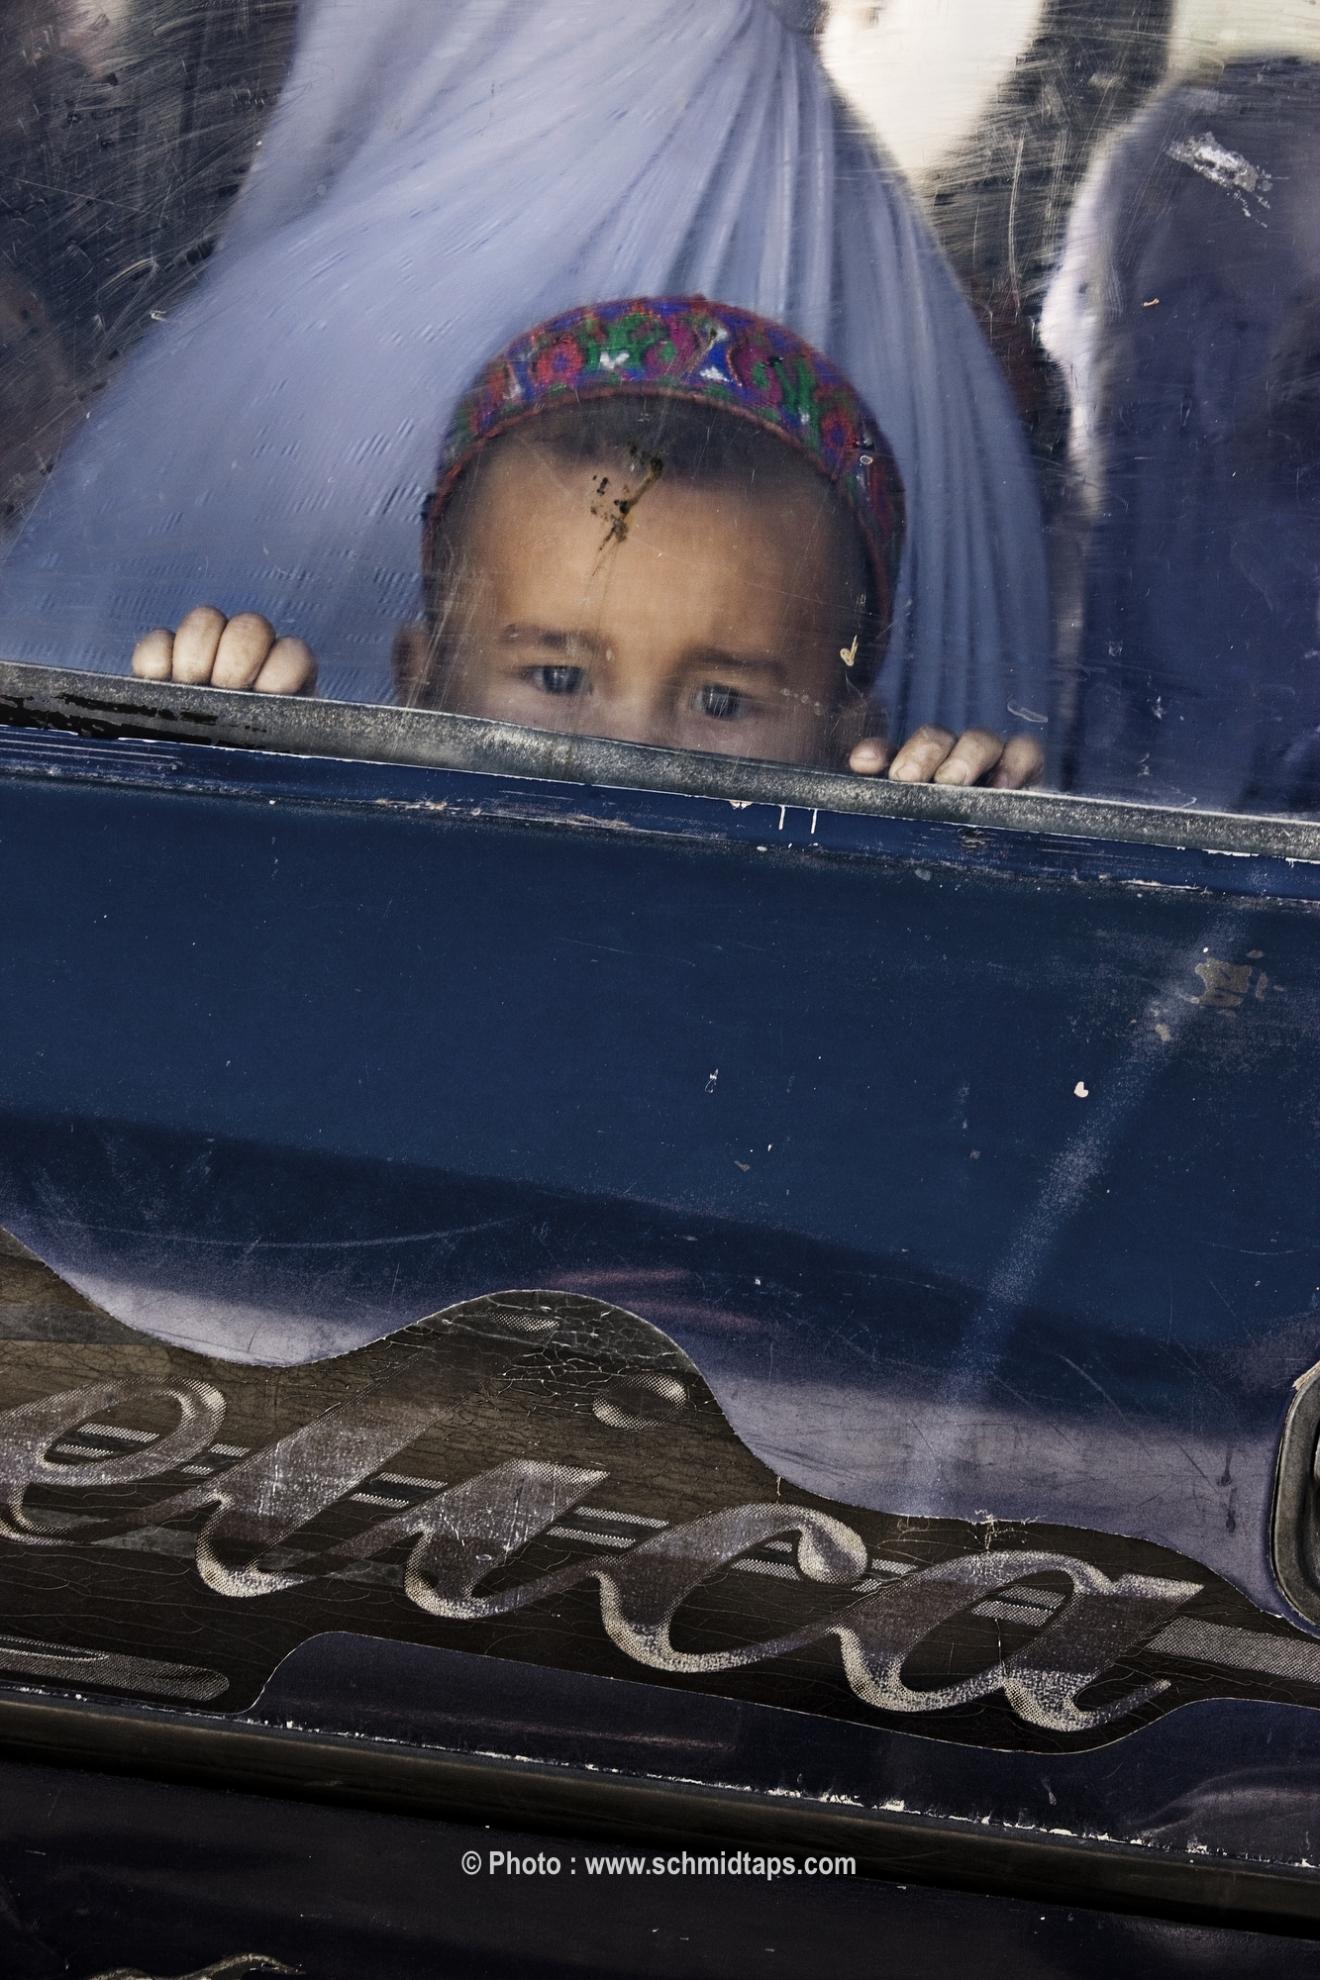 A little boy peeking out a car window. Photo: Lars Schmidt, 2010-'13